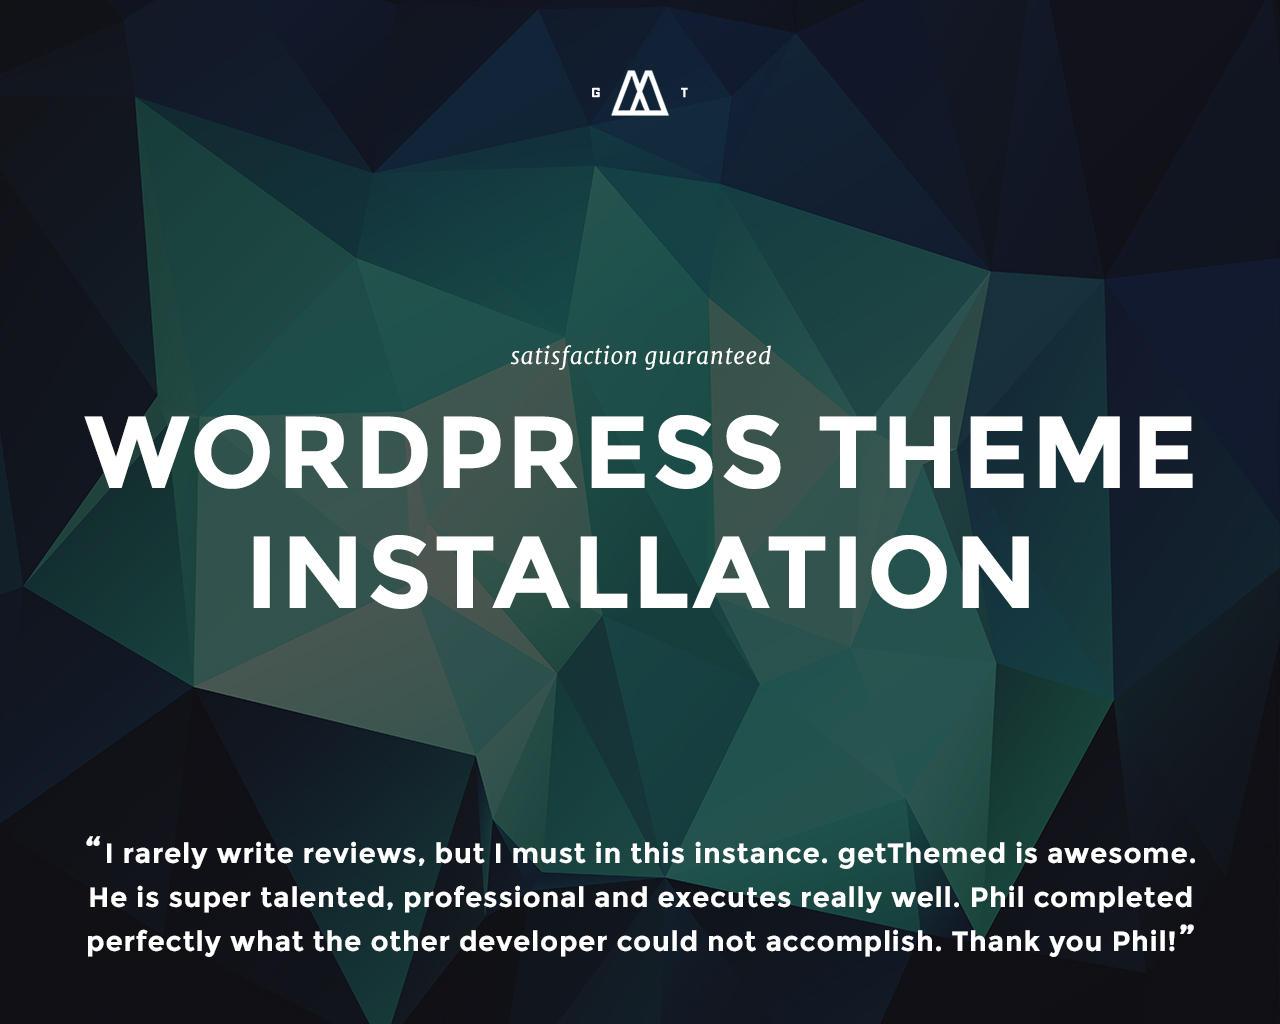 WordPress Theme Installation - Theme, Demo Content, and Plugin ...